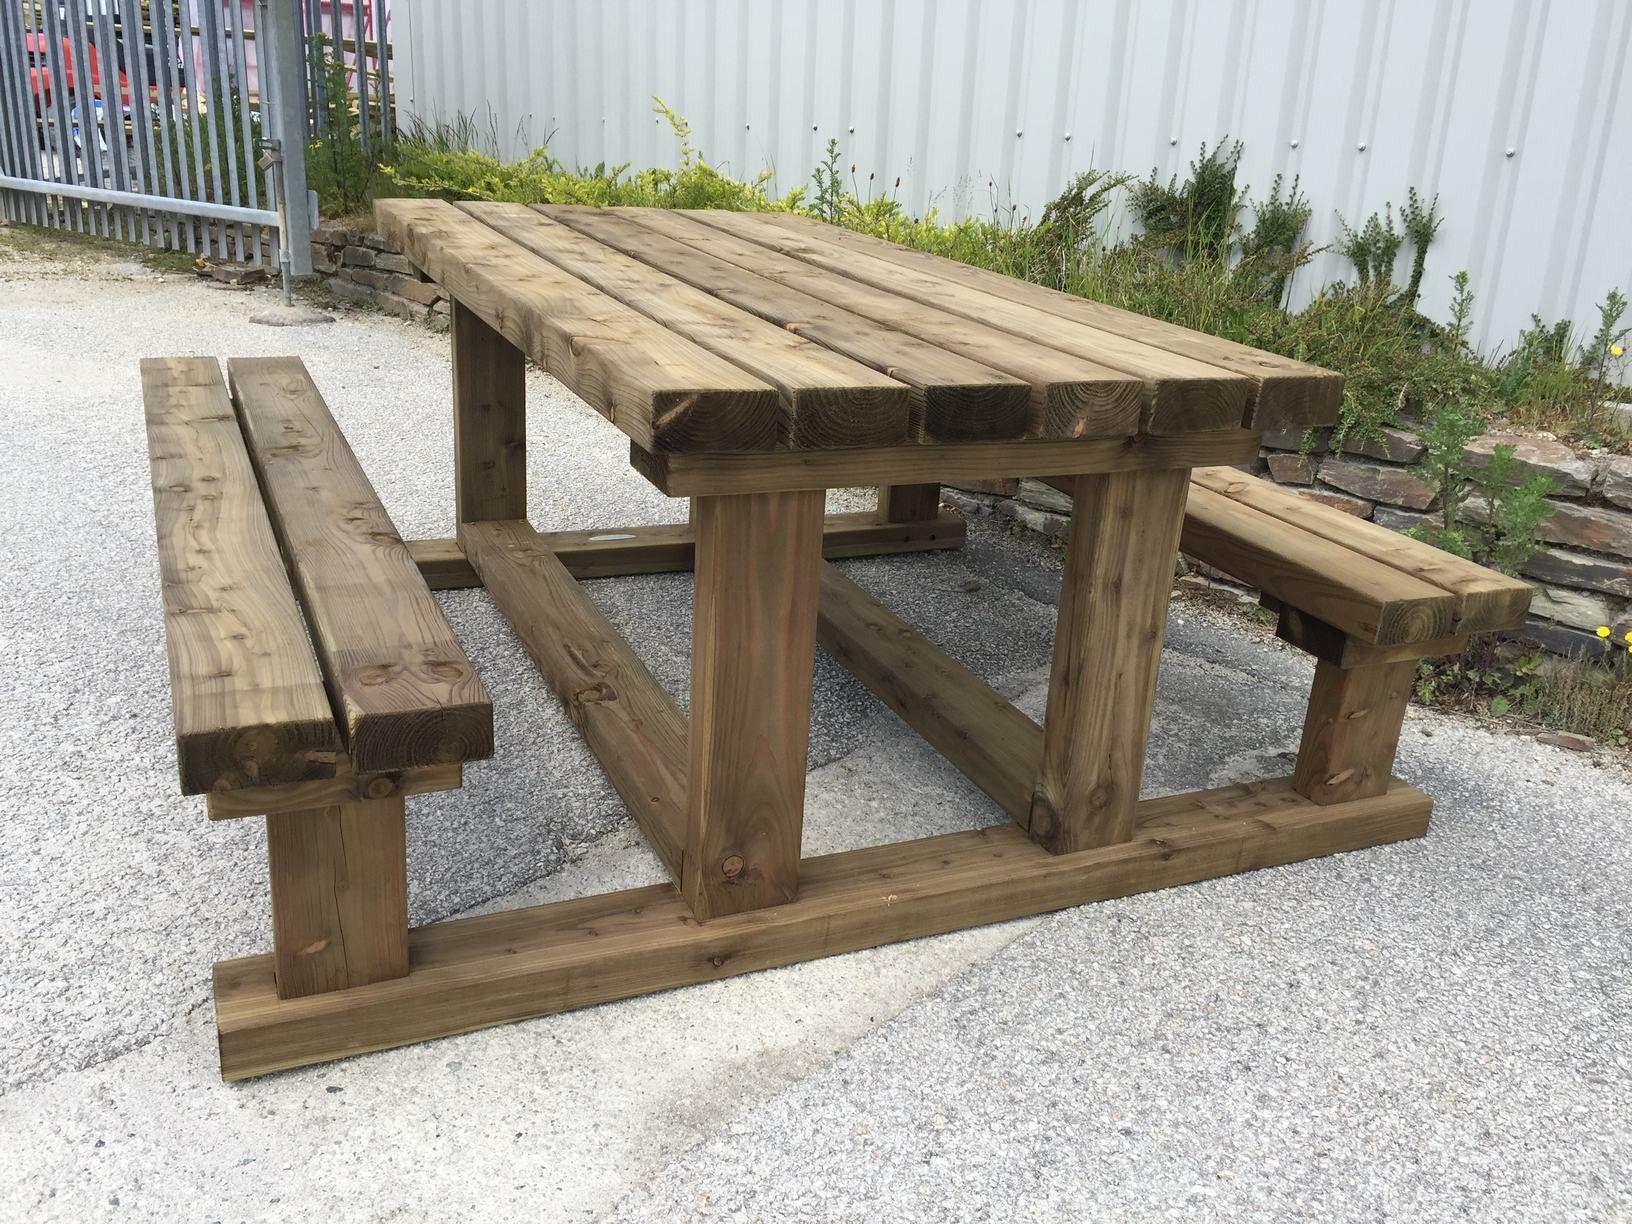 Heavy Duty Picnic Table Diy Picnic Table Wooden Picnic Tables Picnic Table Plans